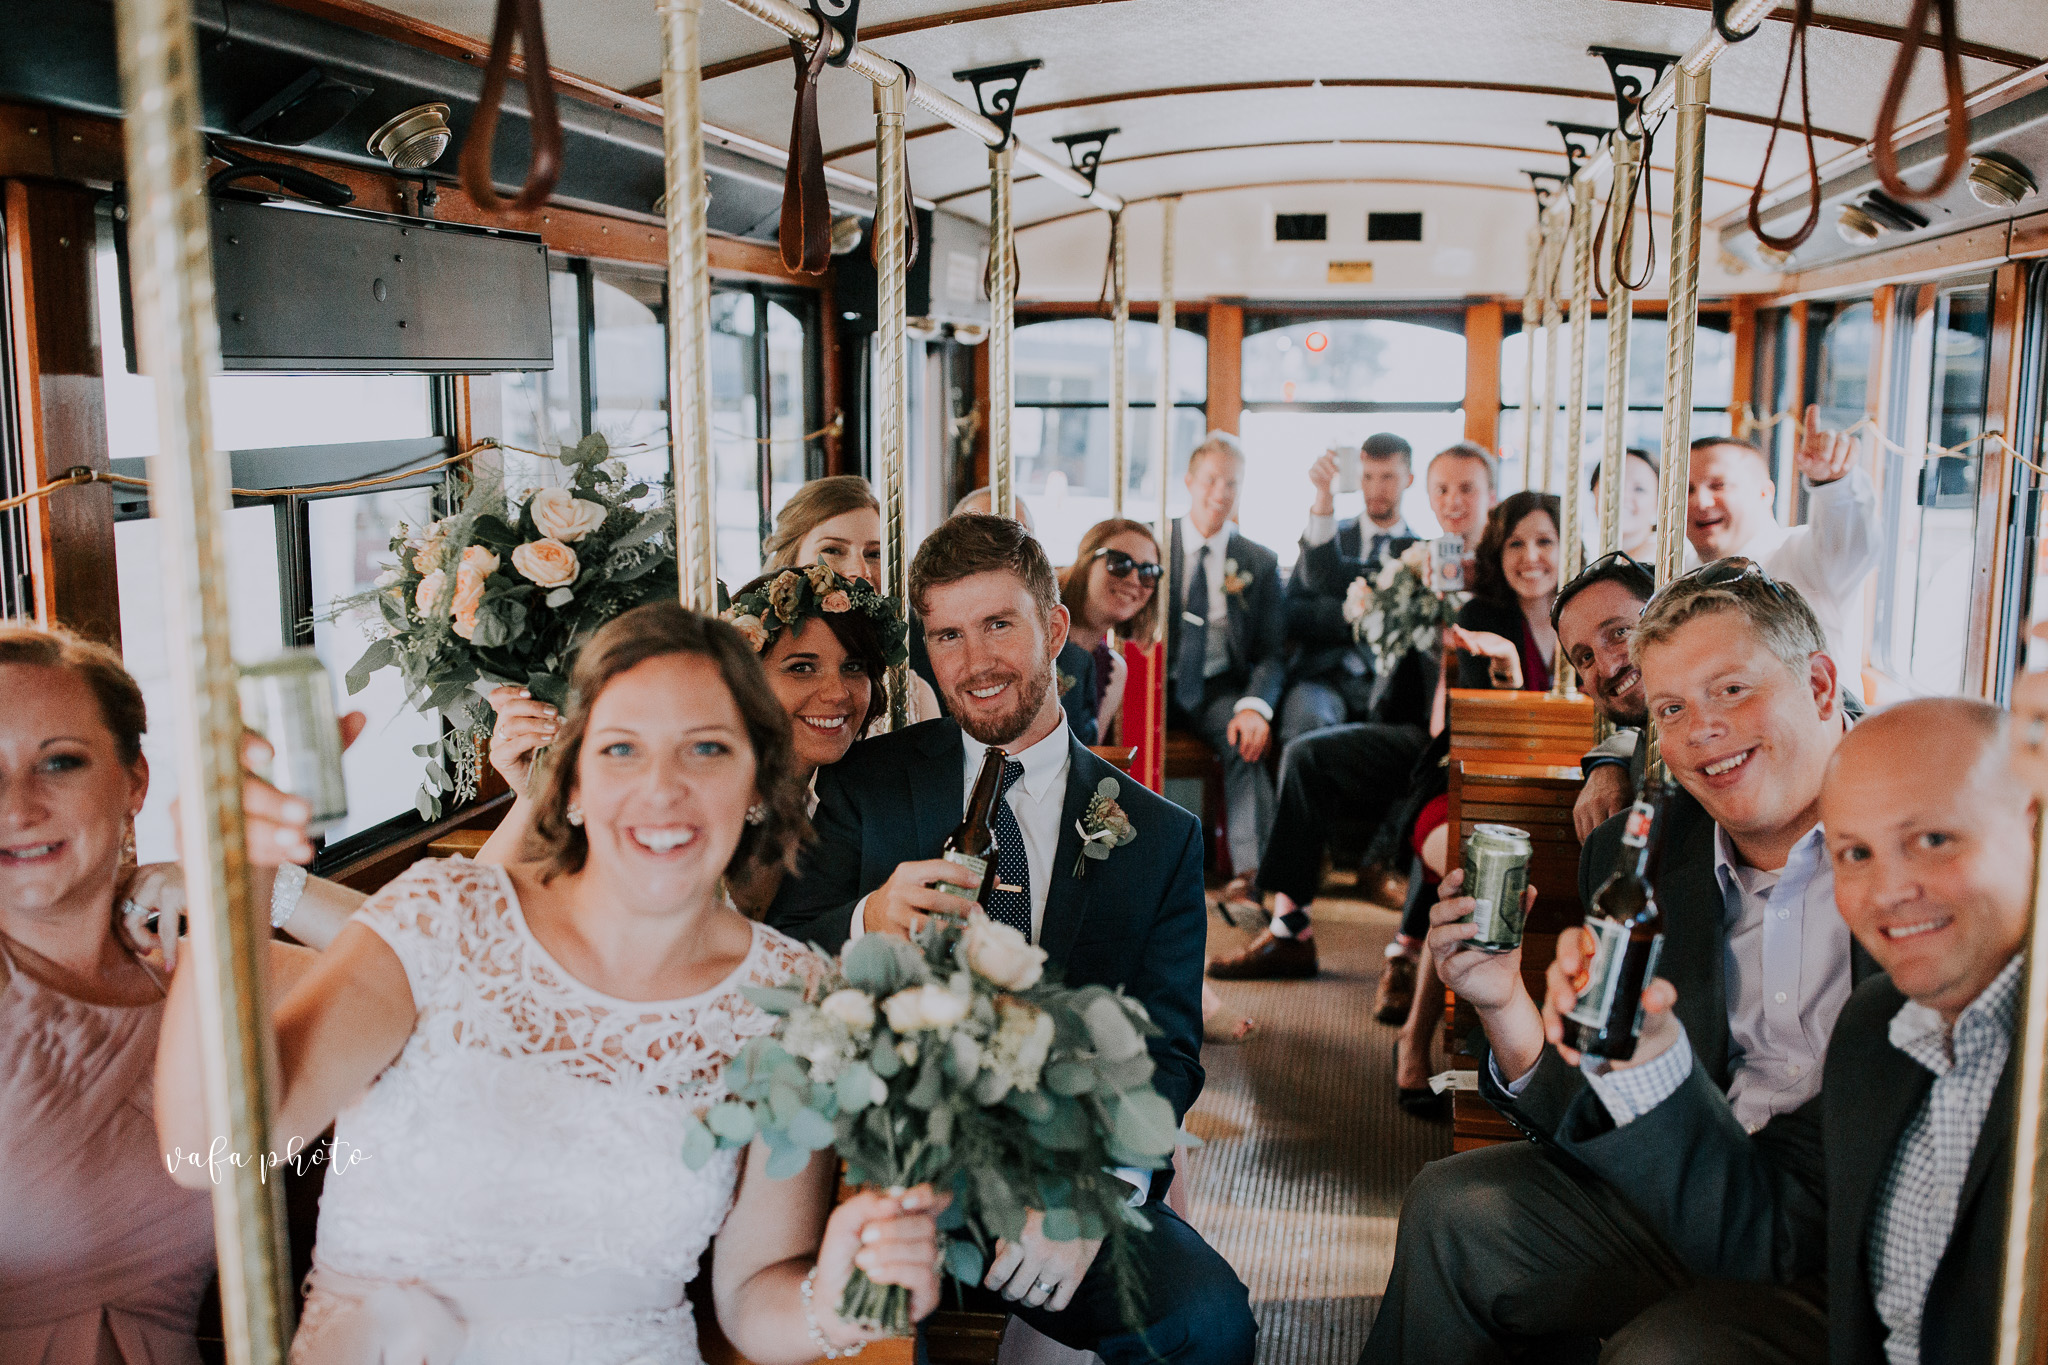 Milwaukee-Athletic-Club-Wedding-Amanda-Tony-Vafa-Photo-804.jpg